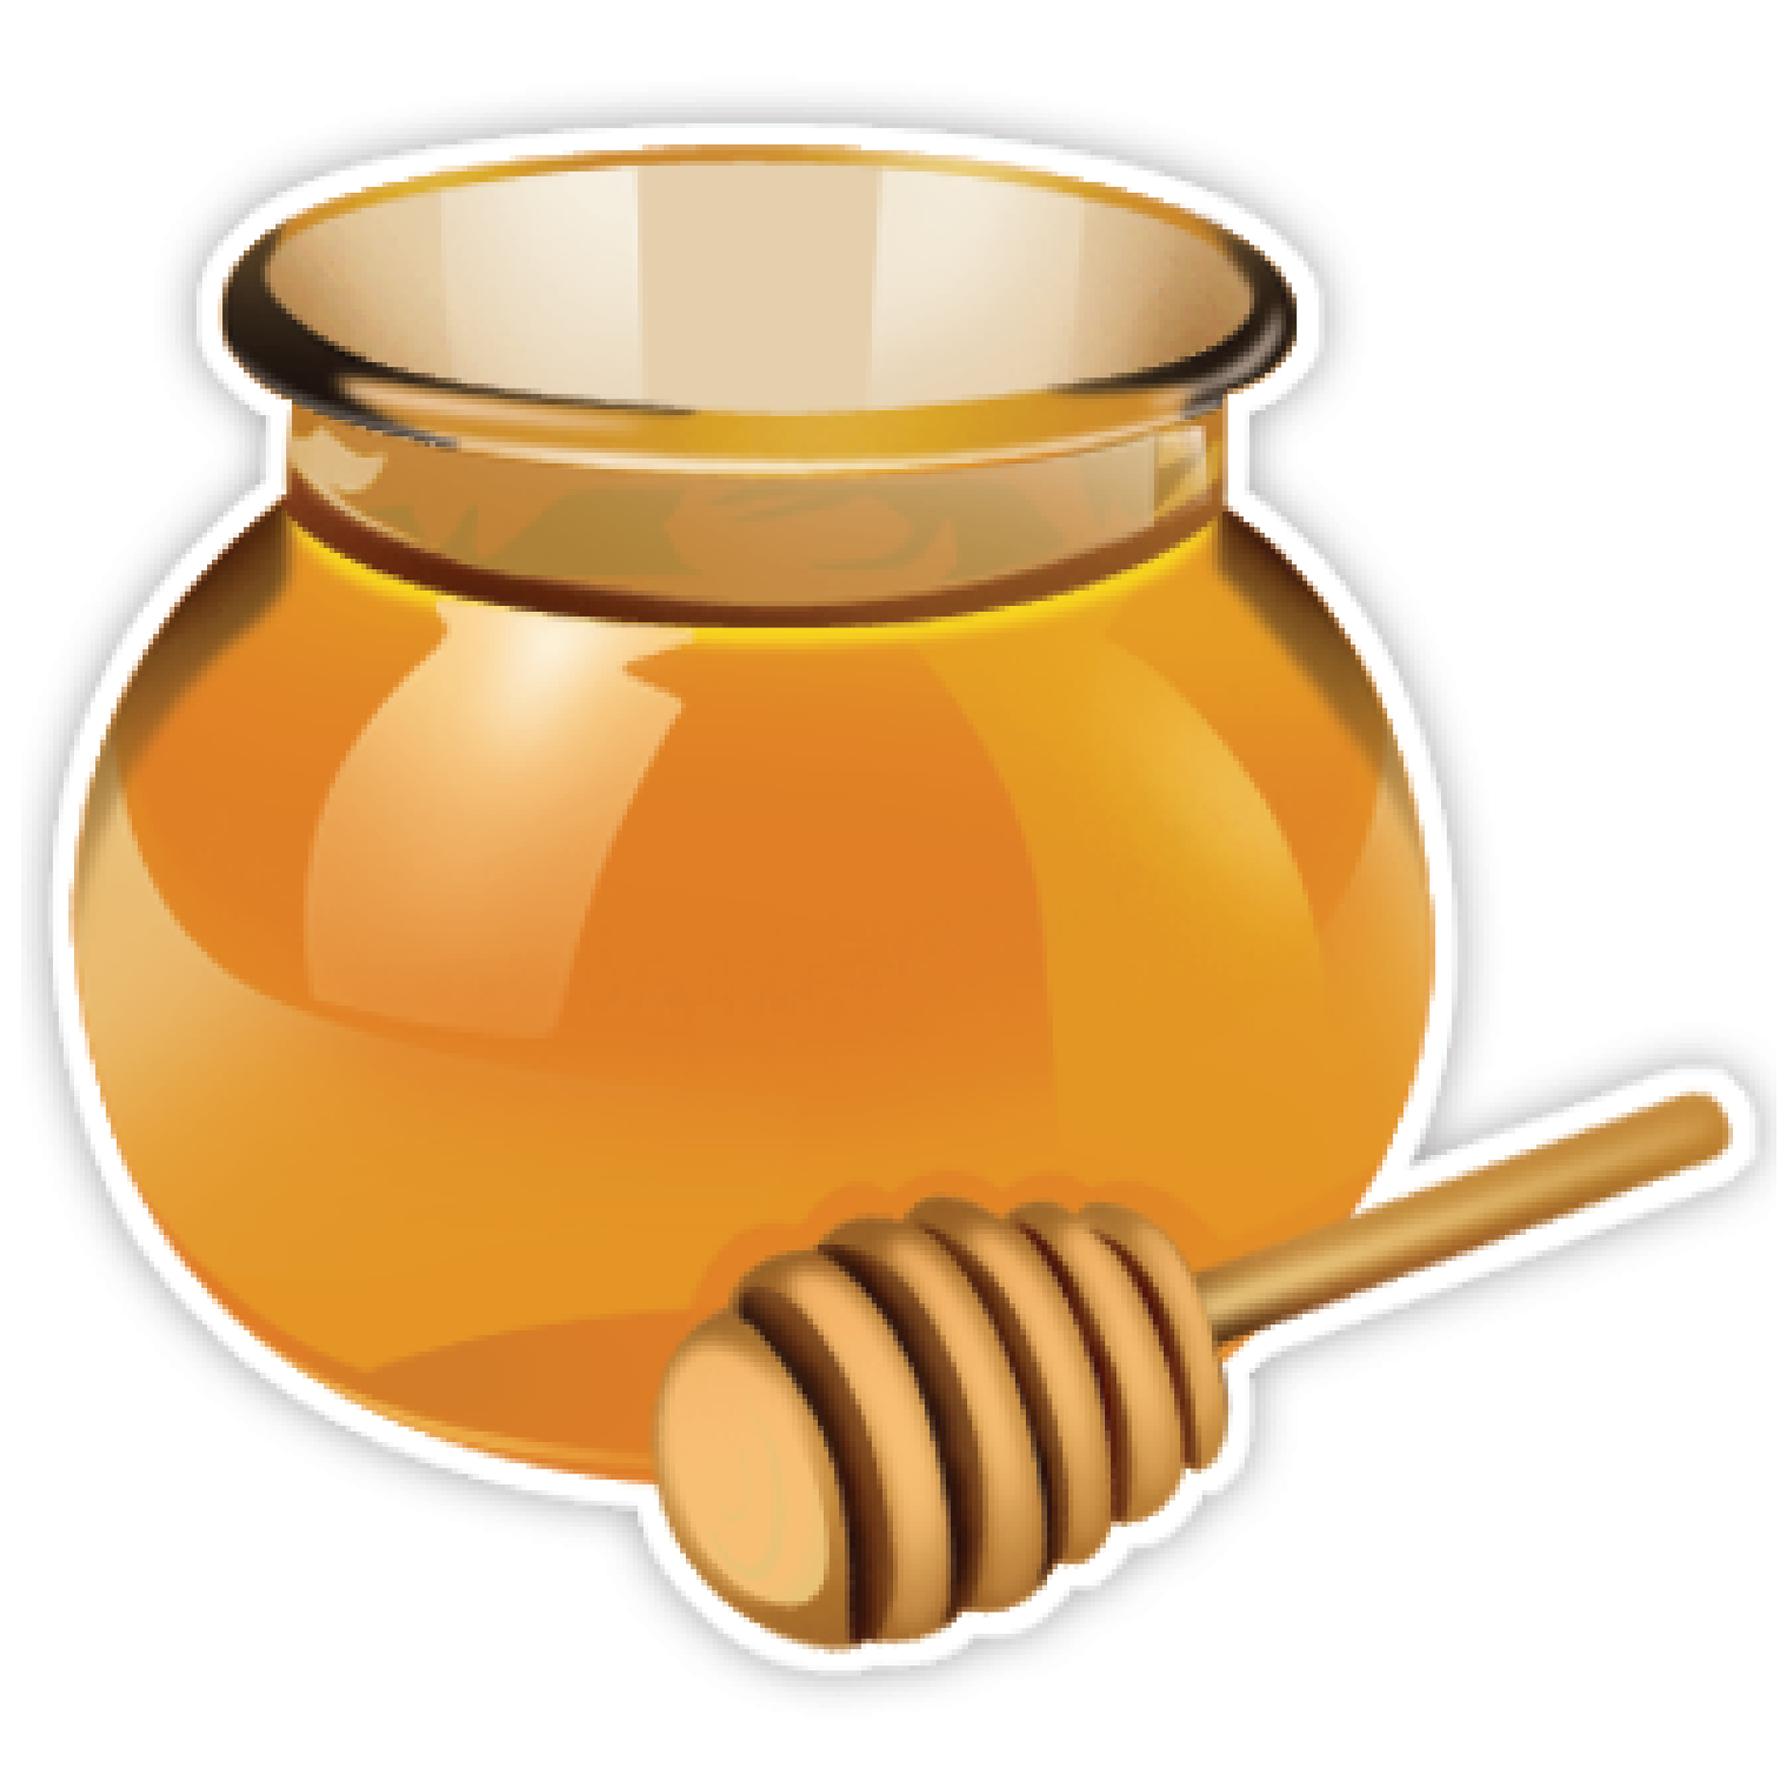 honey jar clipart clipground honey clipart no background honey clipart with transparent background